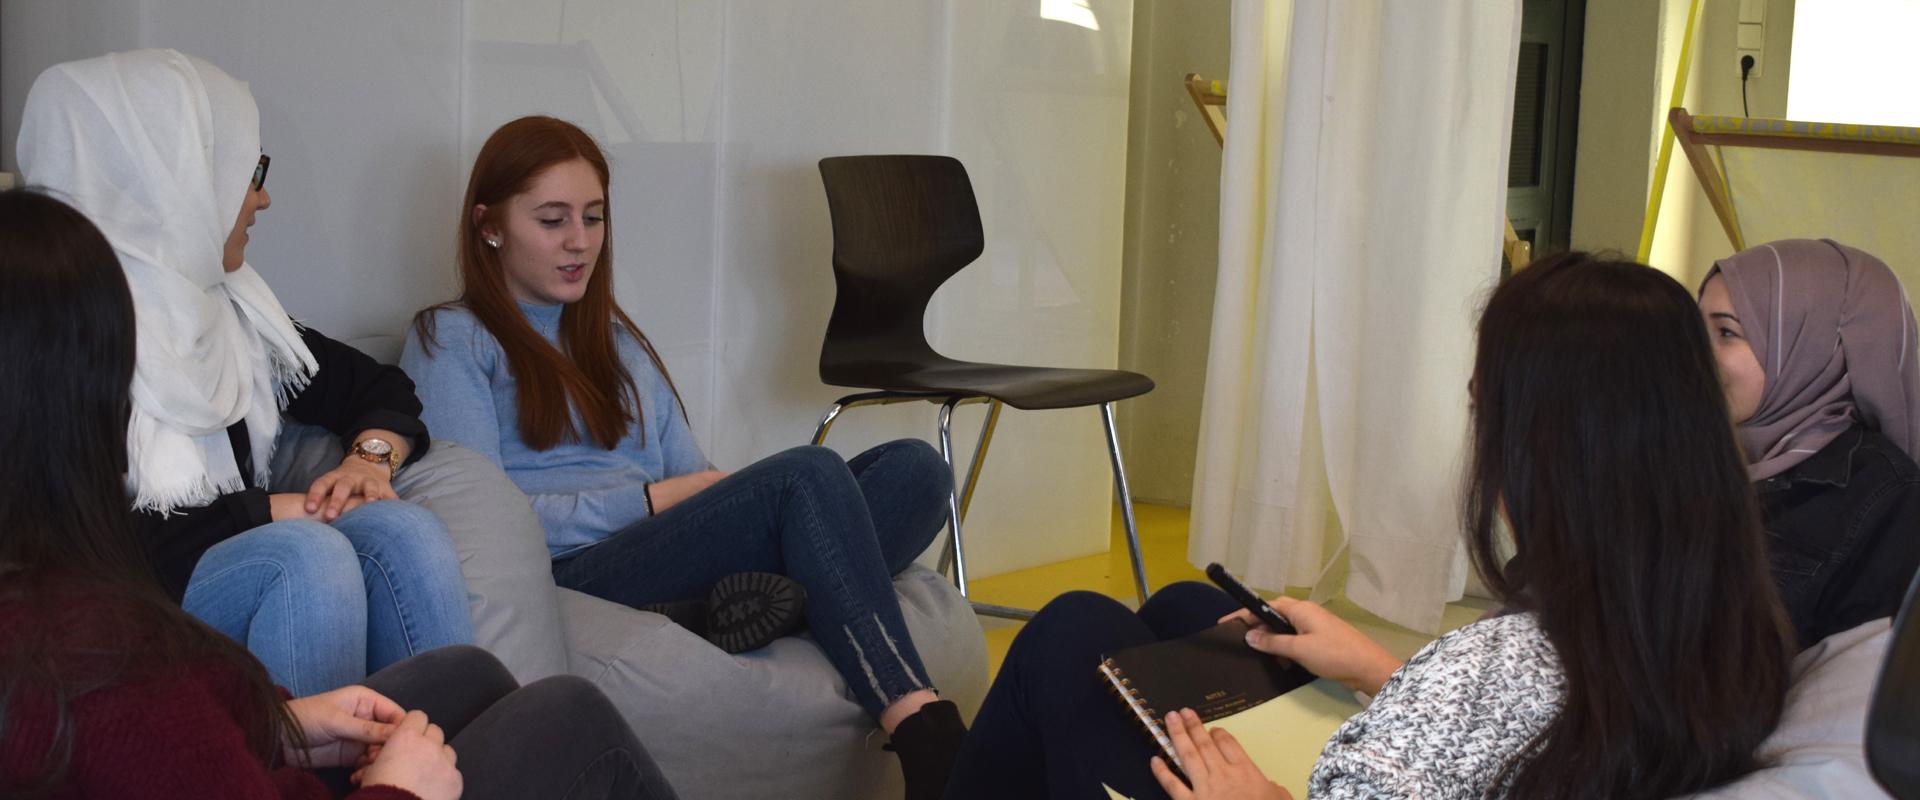 Jugendliche diskutieren in Kleingruppen über JUMA